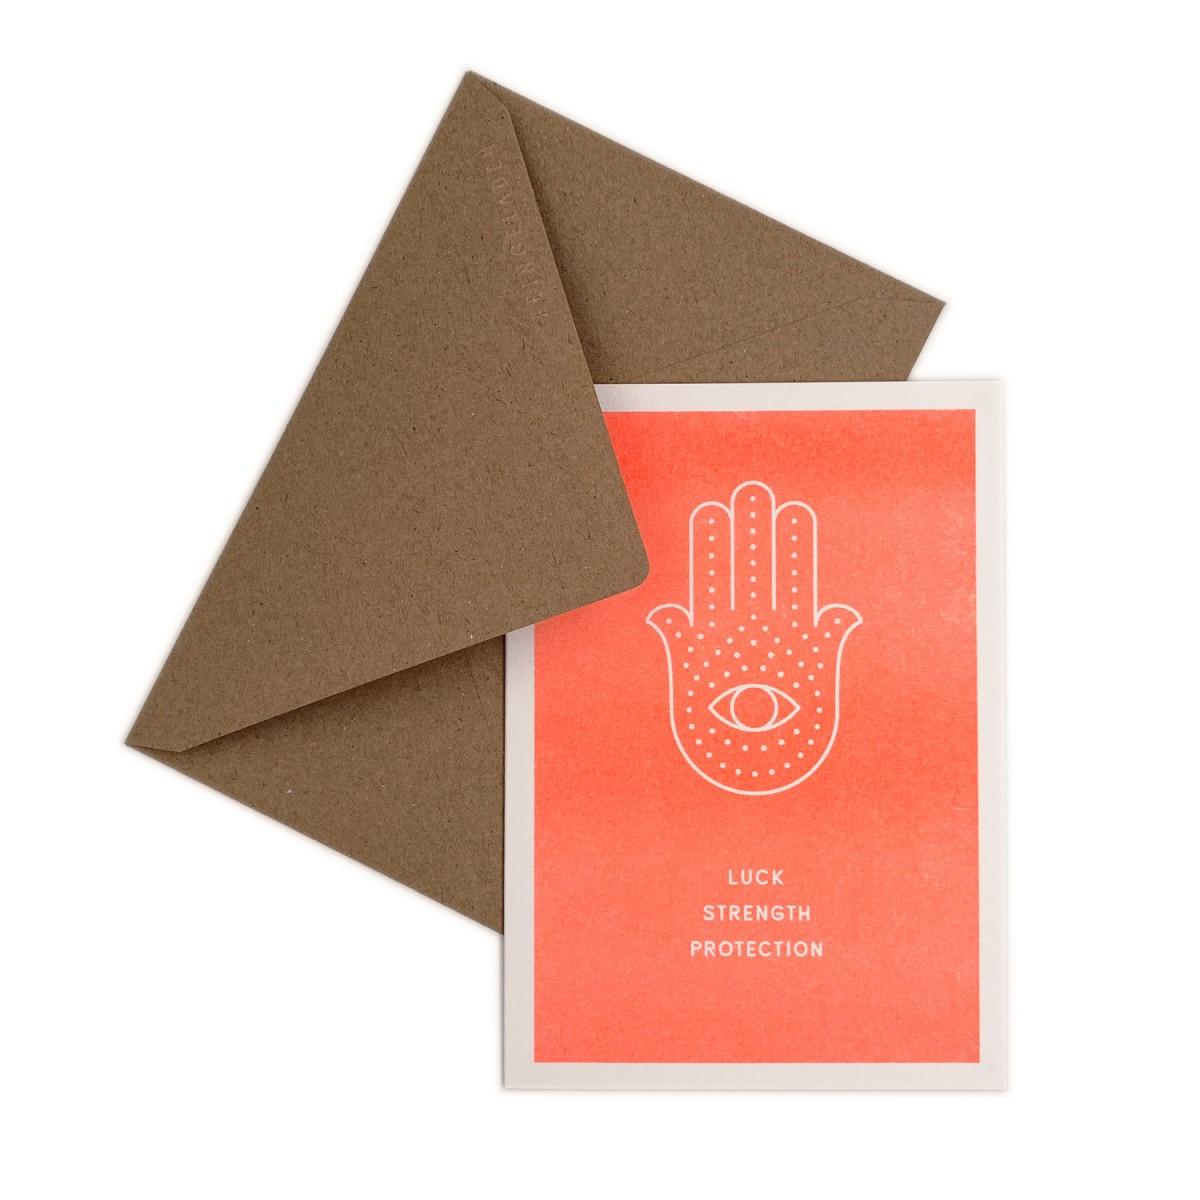 Feingeladen // SIMPLY DIVINE // Hamsa Hand »Luck Strength Protection« (FO) // RISO-Klappkarte, A6